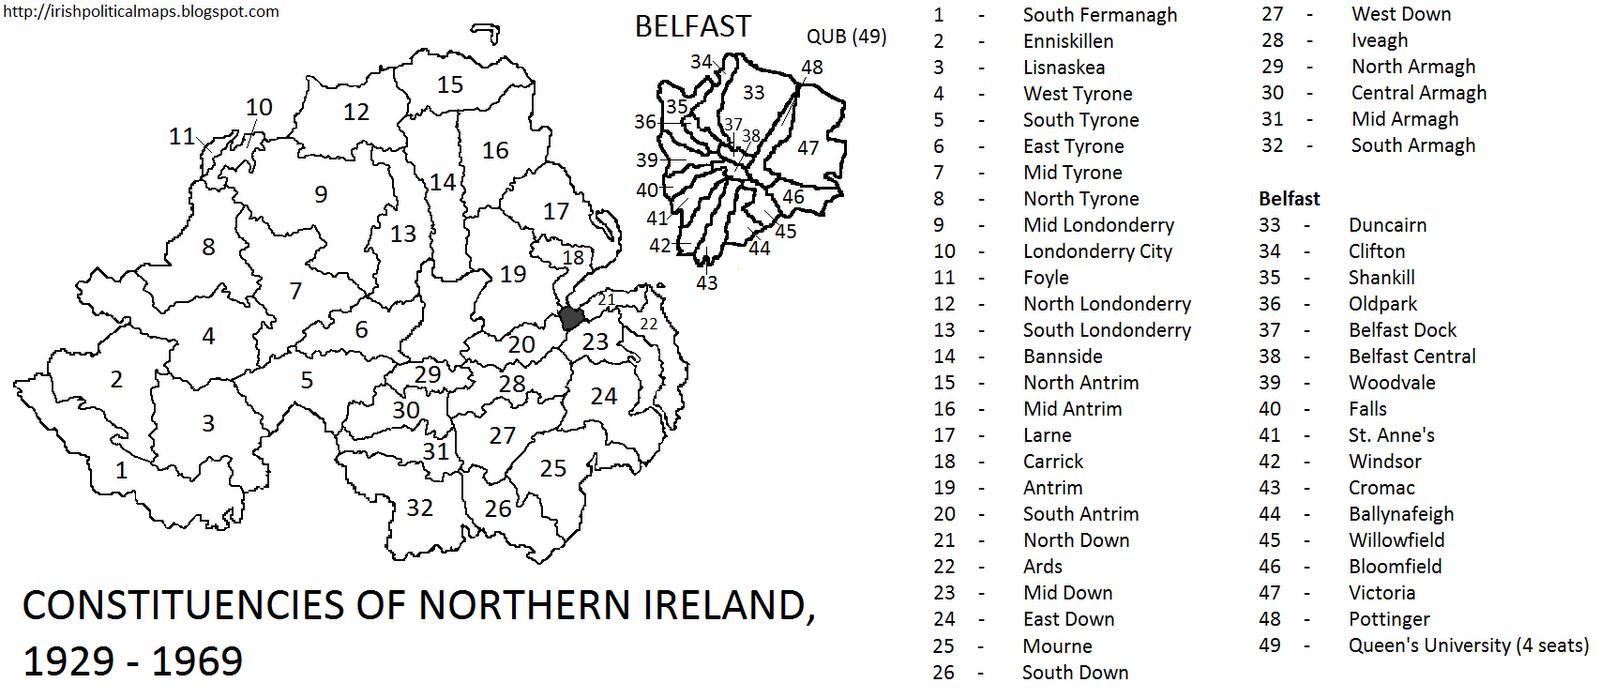 Irish Political Maps: Constituencies of Northern Ireland